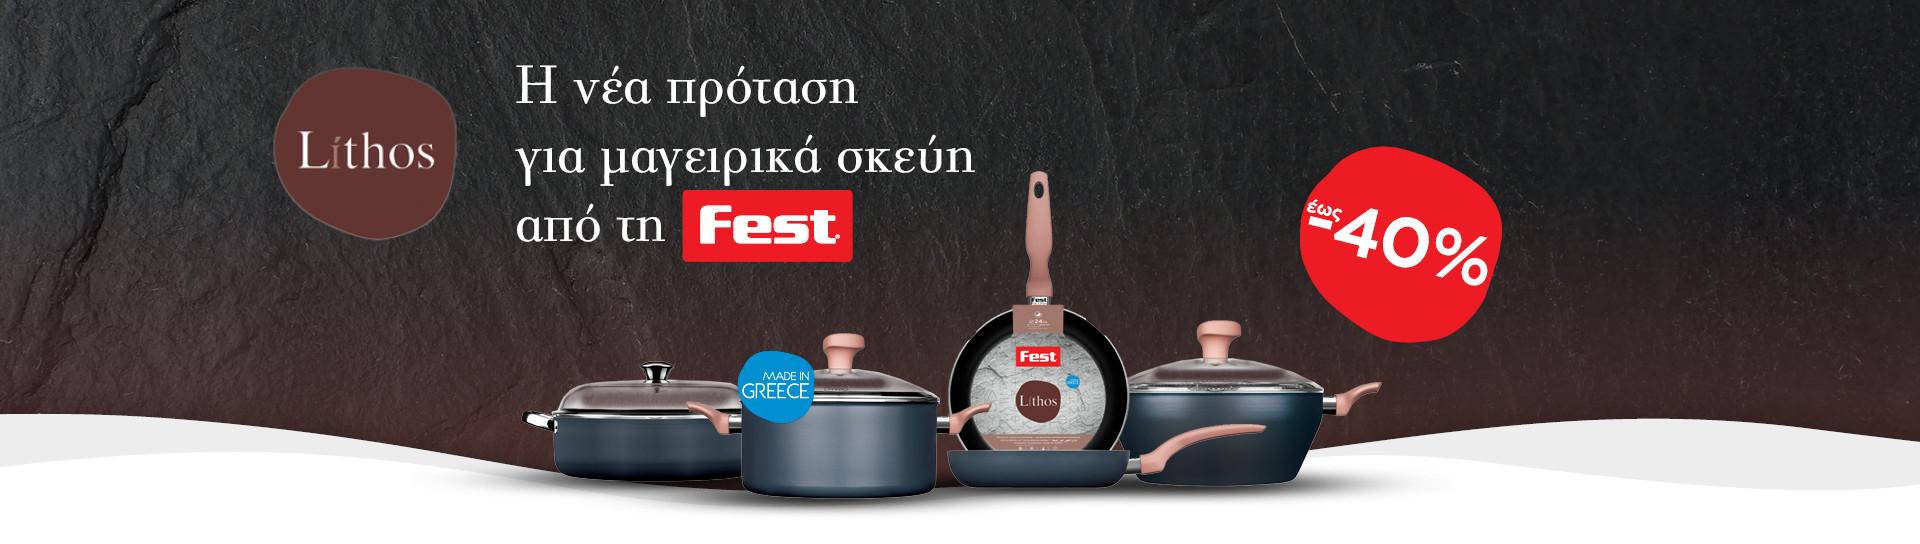 Fest Lithos